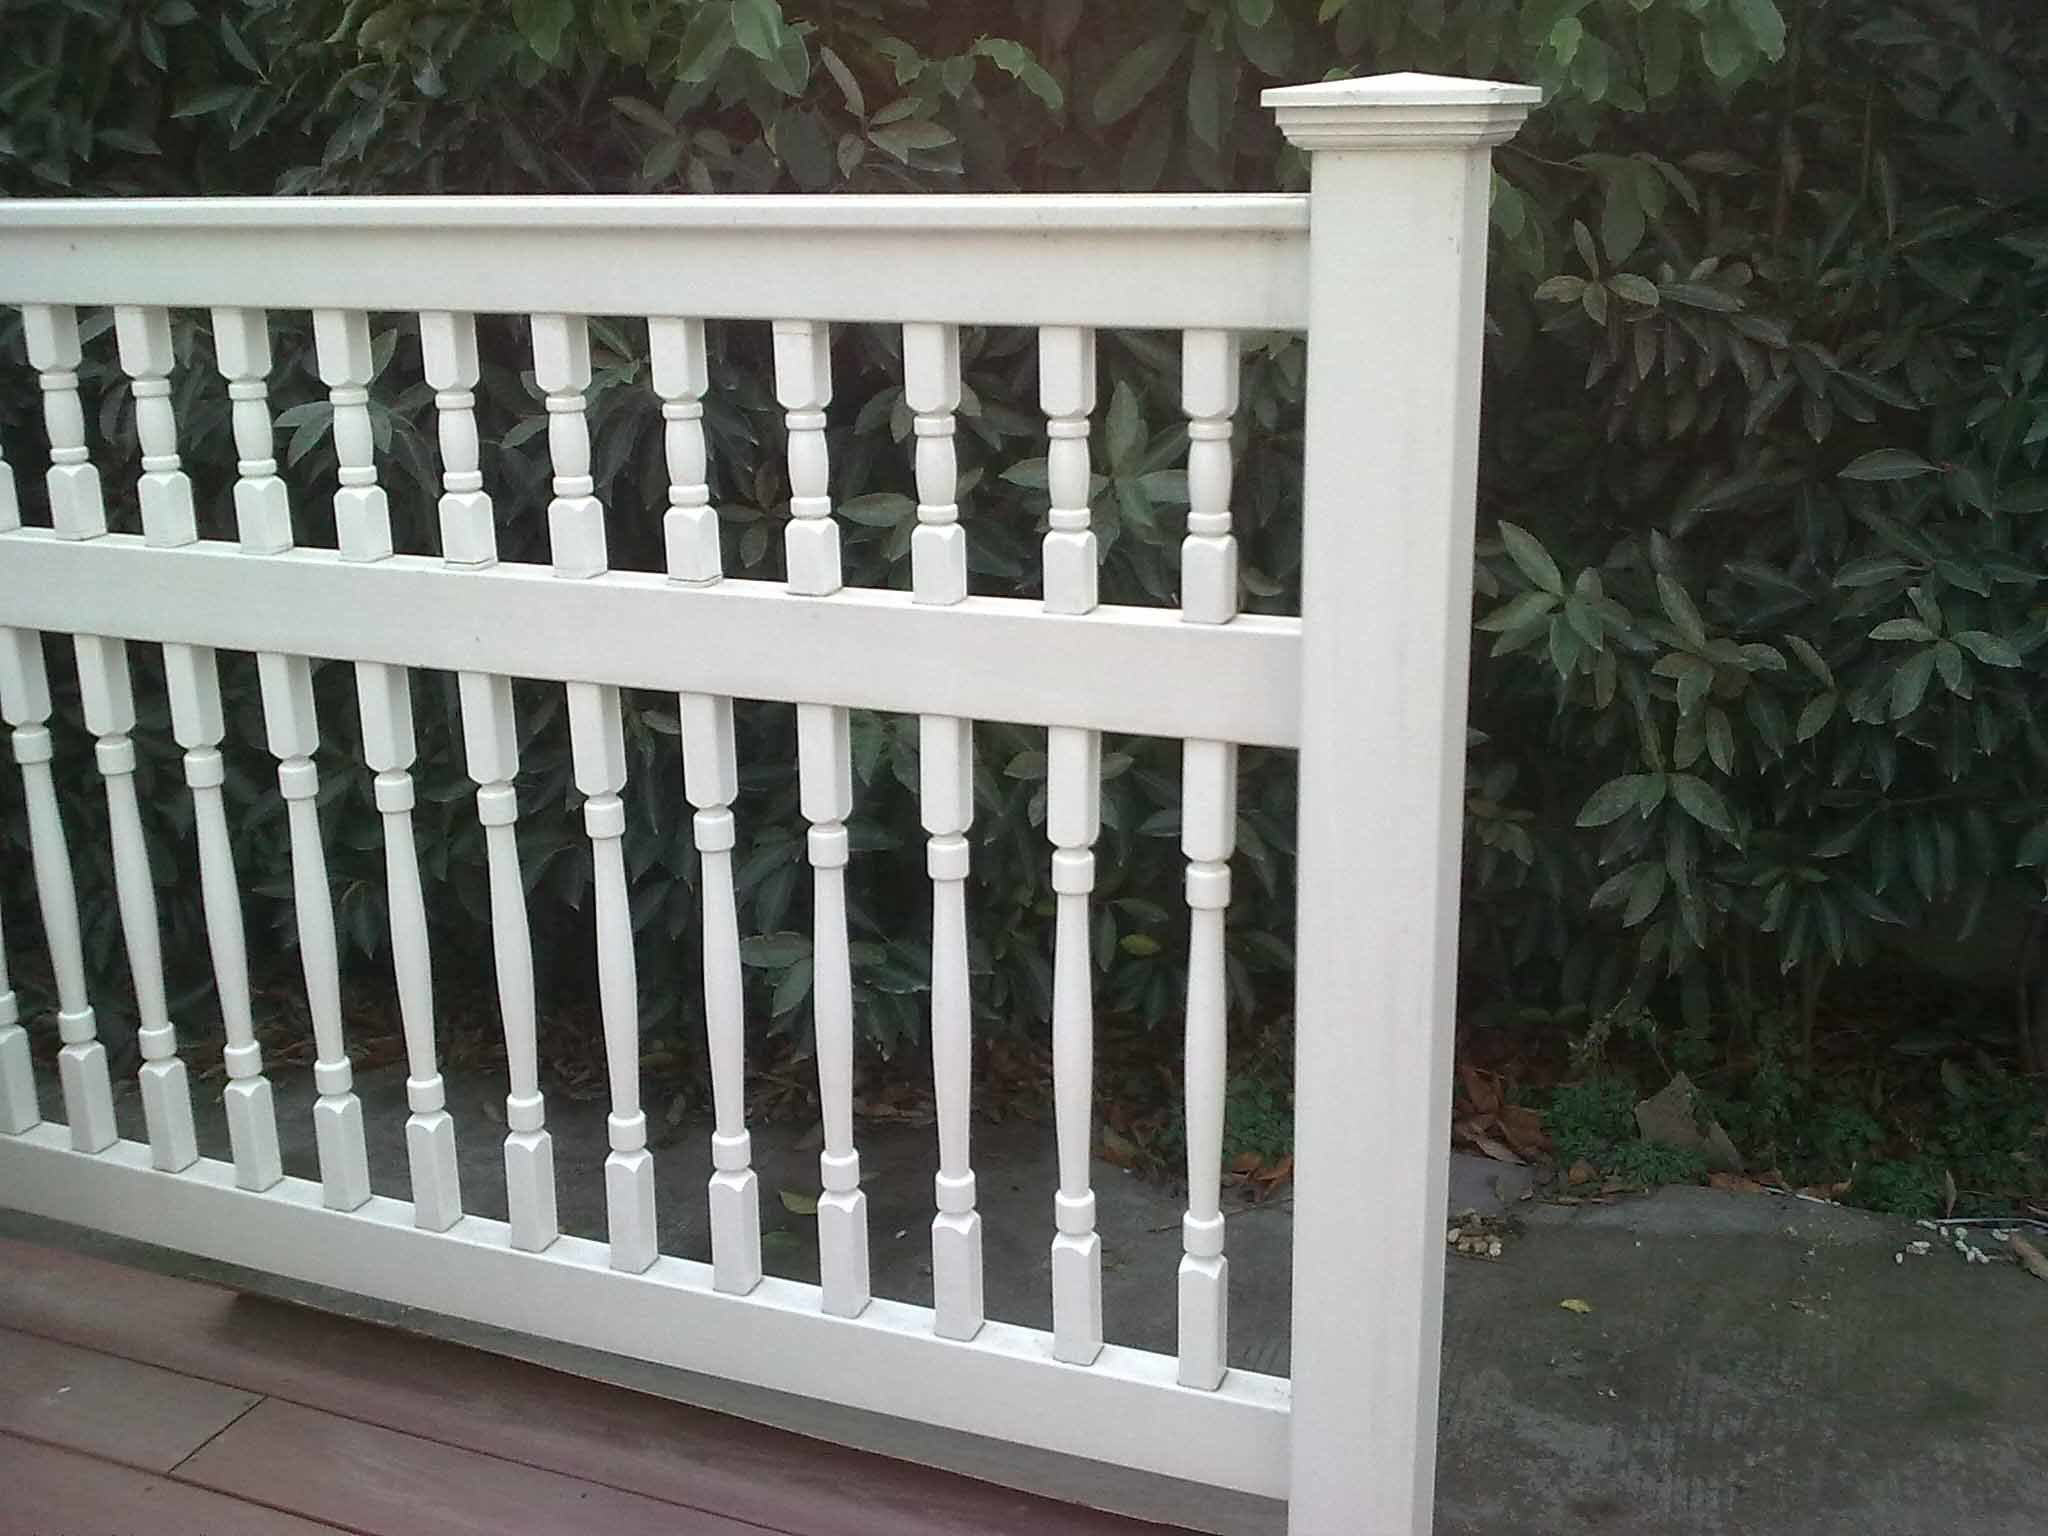 china uv resistance pvc balustrade bl 2 china pvc handrail barrier. Black Bedroom Furniture Sets. Home Design Ideas